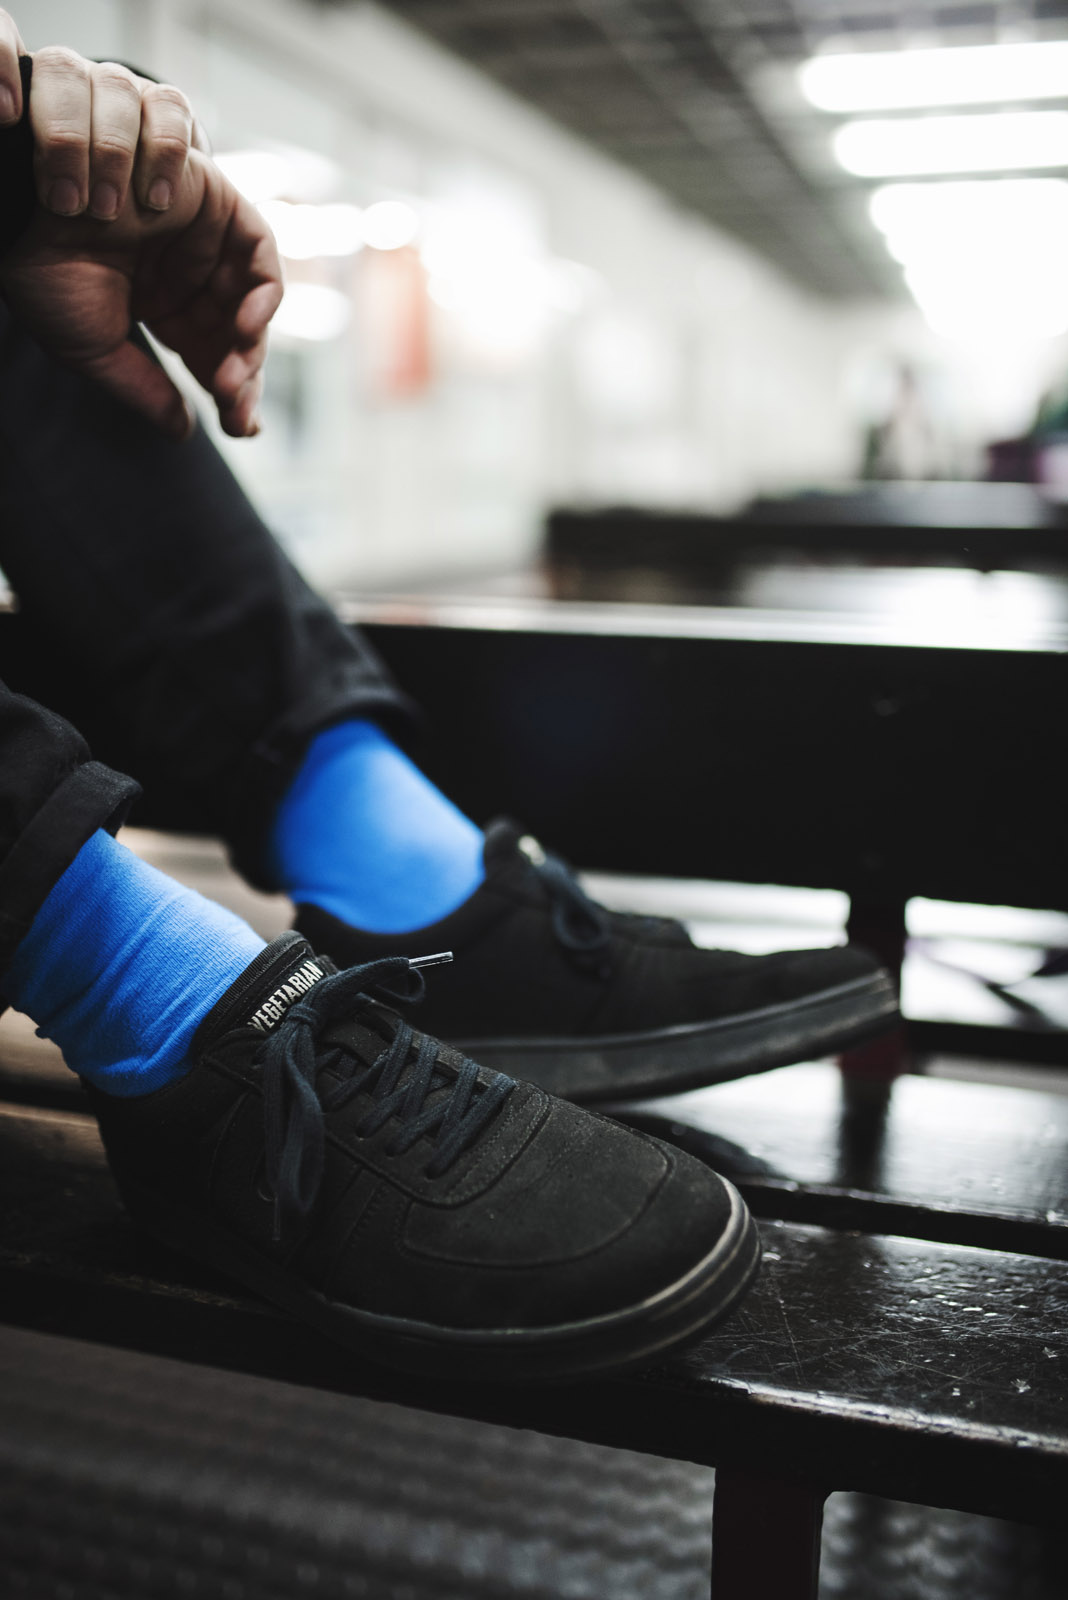 Z² – Zahn und Zieger | Erika-Heß-Eisstadion | Outfit | Rotholz & Vegetarian Shoes & Sock Up Your Life & Nudie Jeans | Fotostory | Foto: René Zieger | GROSS∆RTIG